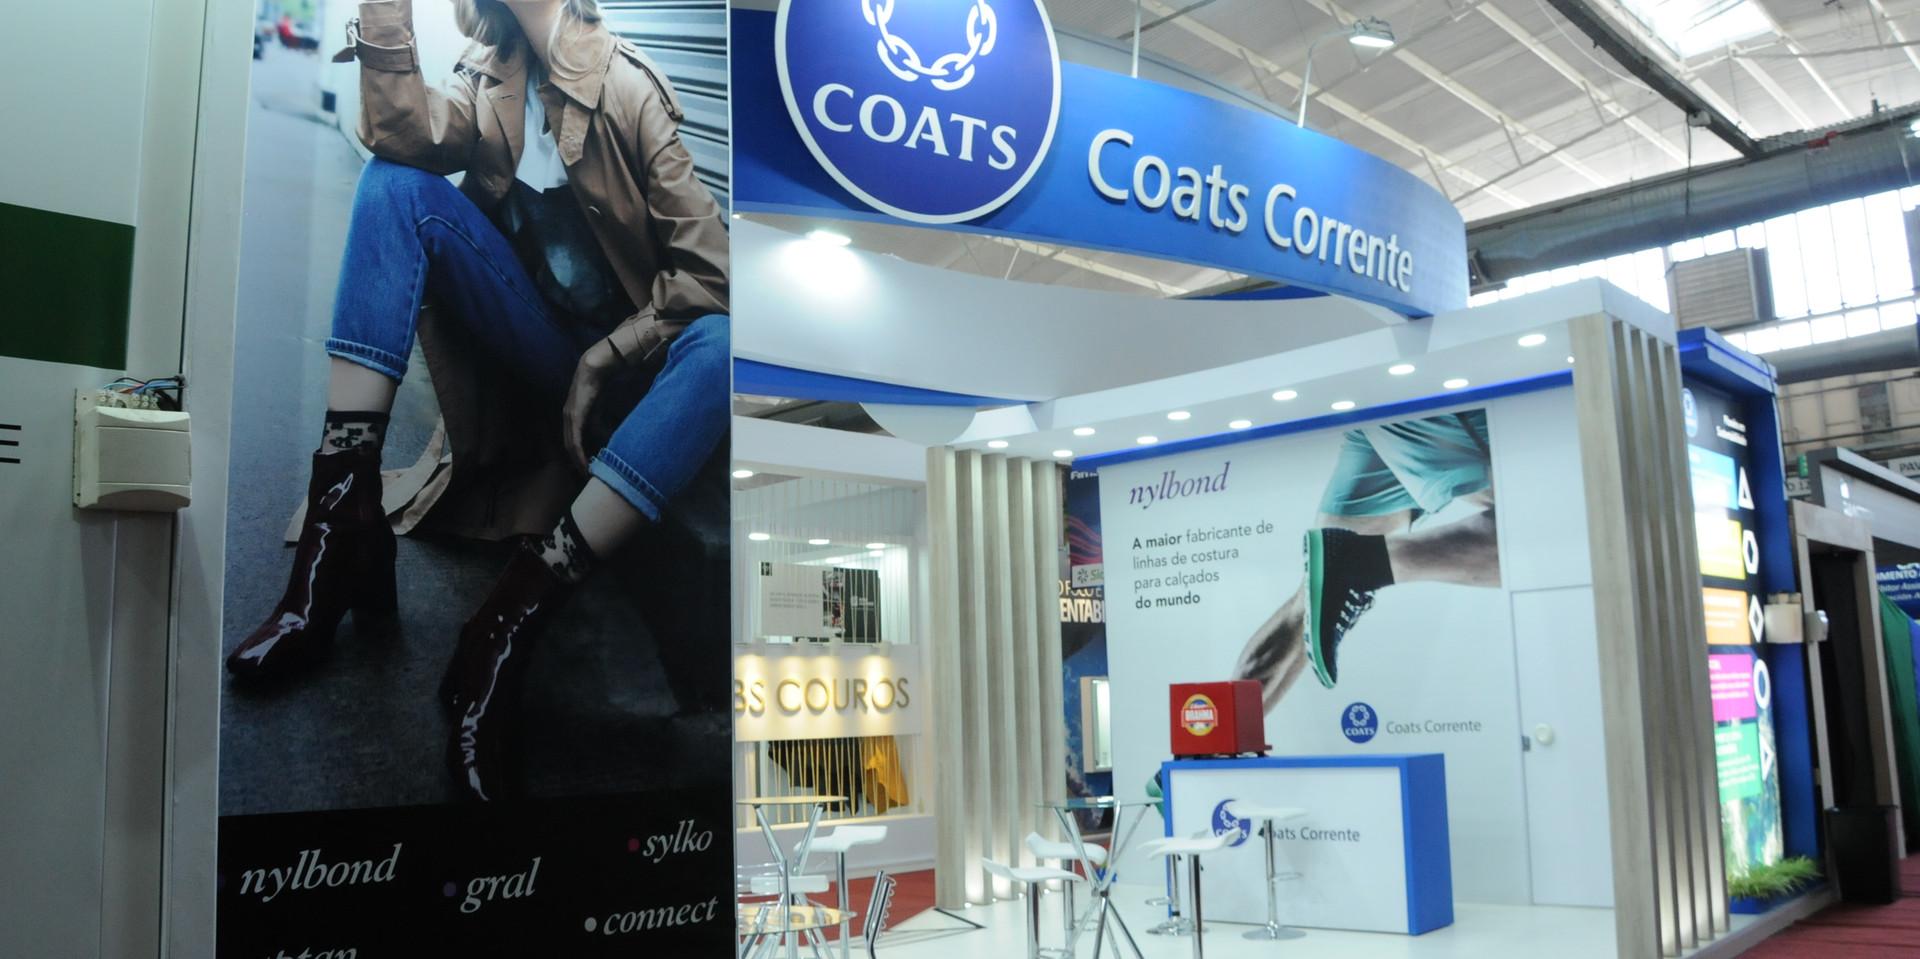 Coats_Correntes_(6)[1].JPG